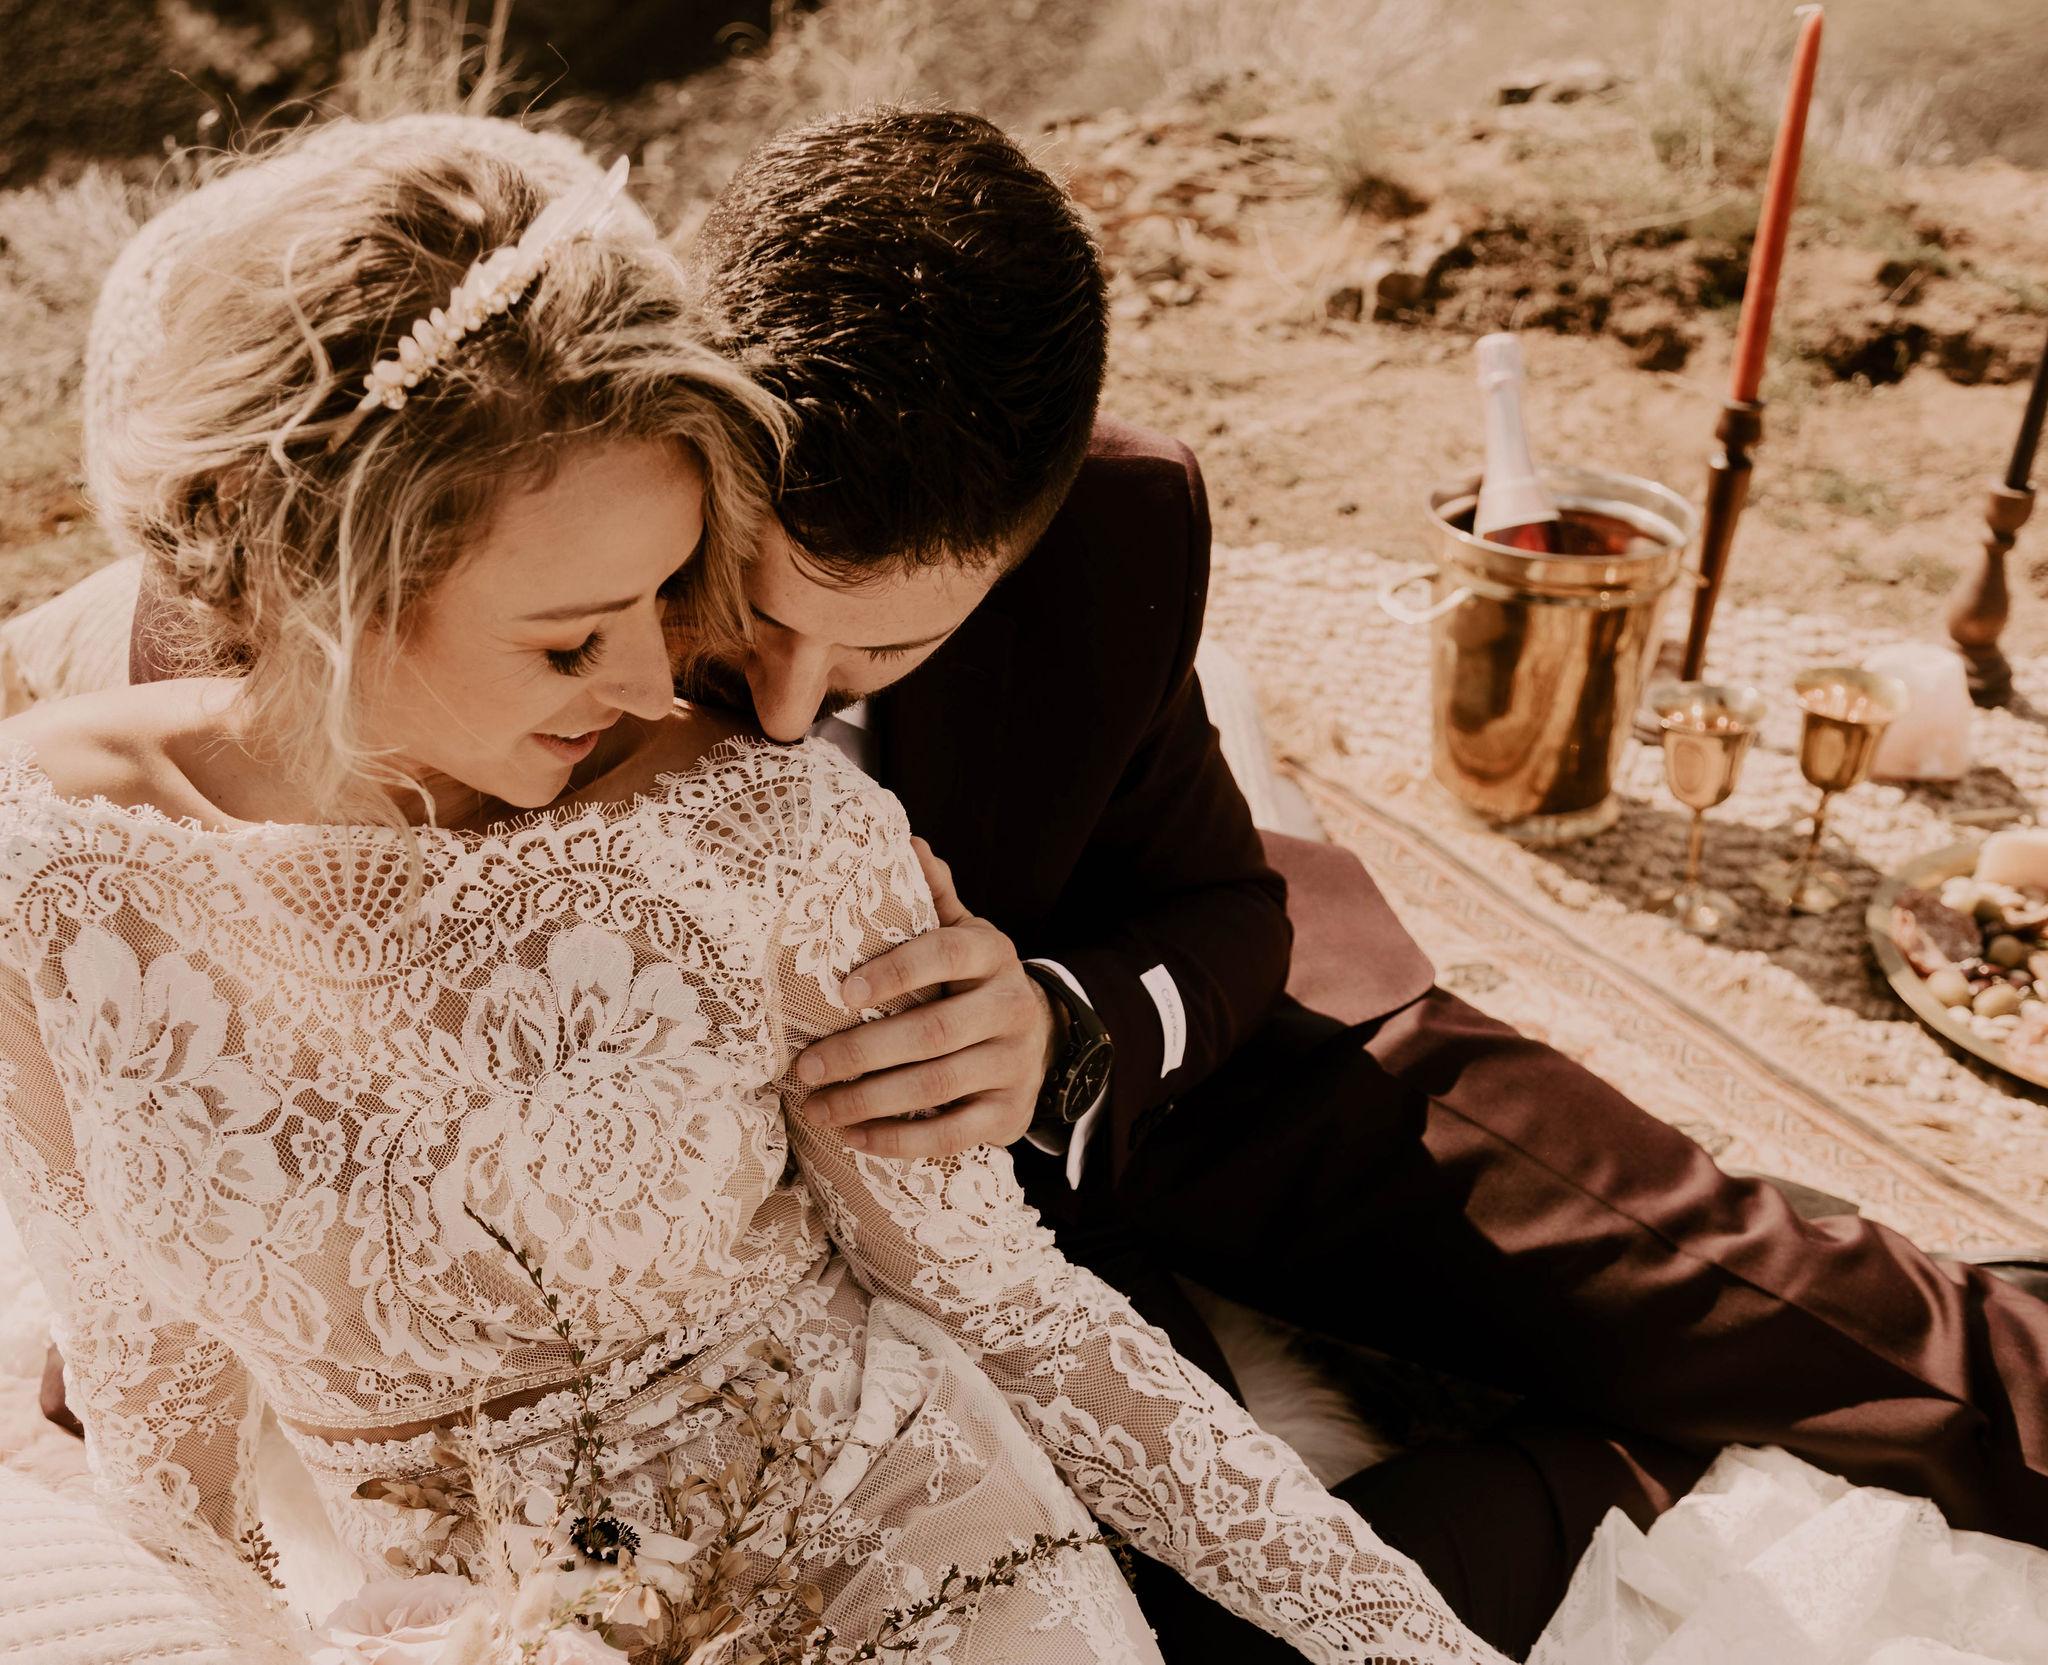 champagne toast spokane bride wedding